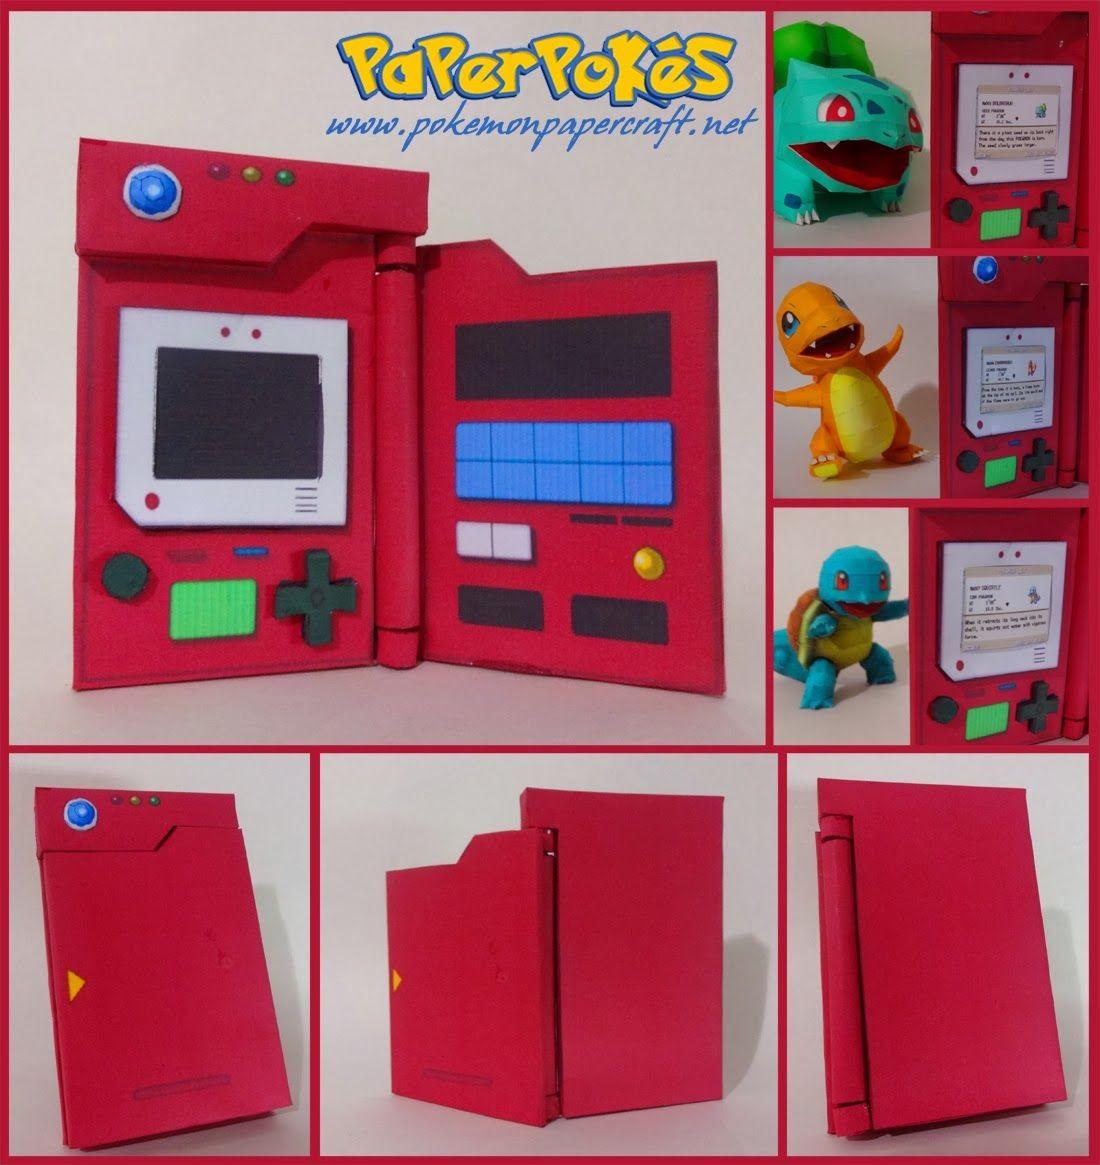 Arcade Papercraft Paperpokés Pokémon Papercrafts Geeky Diy